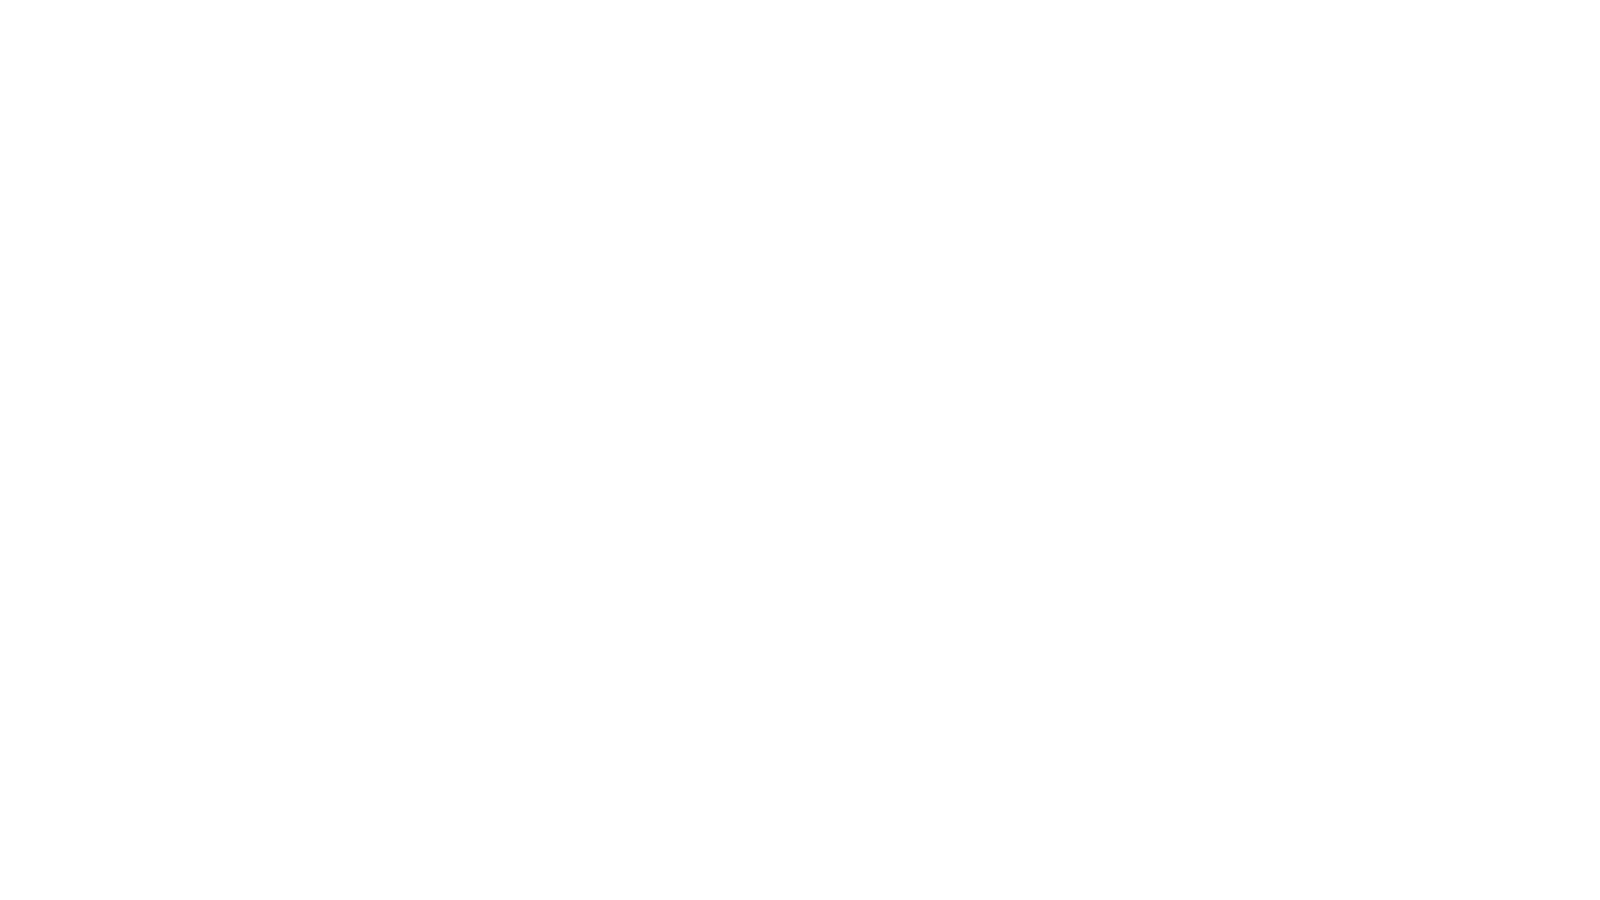 Pengurus Pusat bersama Pengurus Wilayah Jawa Timur Ikatan Notaris Indonesia menyelenggarakan Ujian Kode Etik Notaris (UKEN) Tahun 2021 di Hotel Four Points Surabaya, pada tanggal 26 Juni 2021   Acara dilaksanakan dengan tetap mematuhi Protokol Kesehatan, serta dilakukan swab test terhadap seluruh peserta dan panitia acara